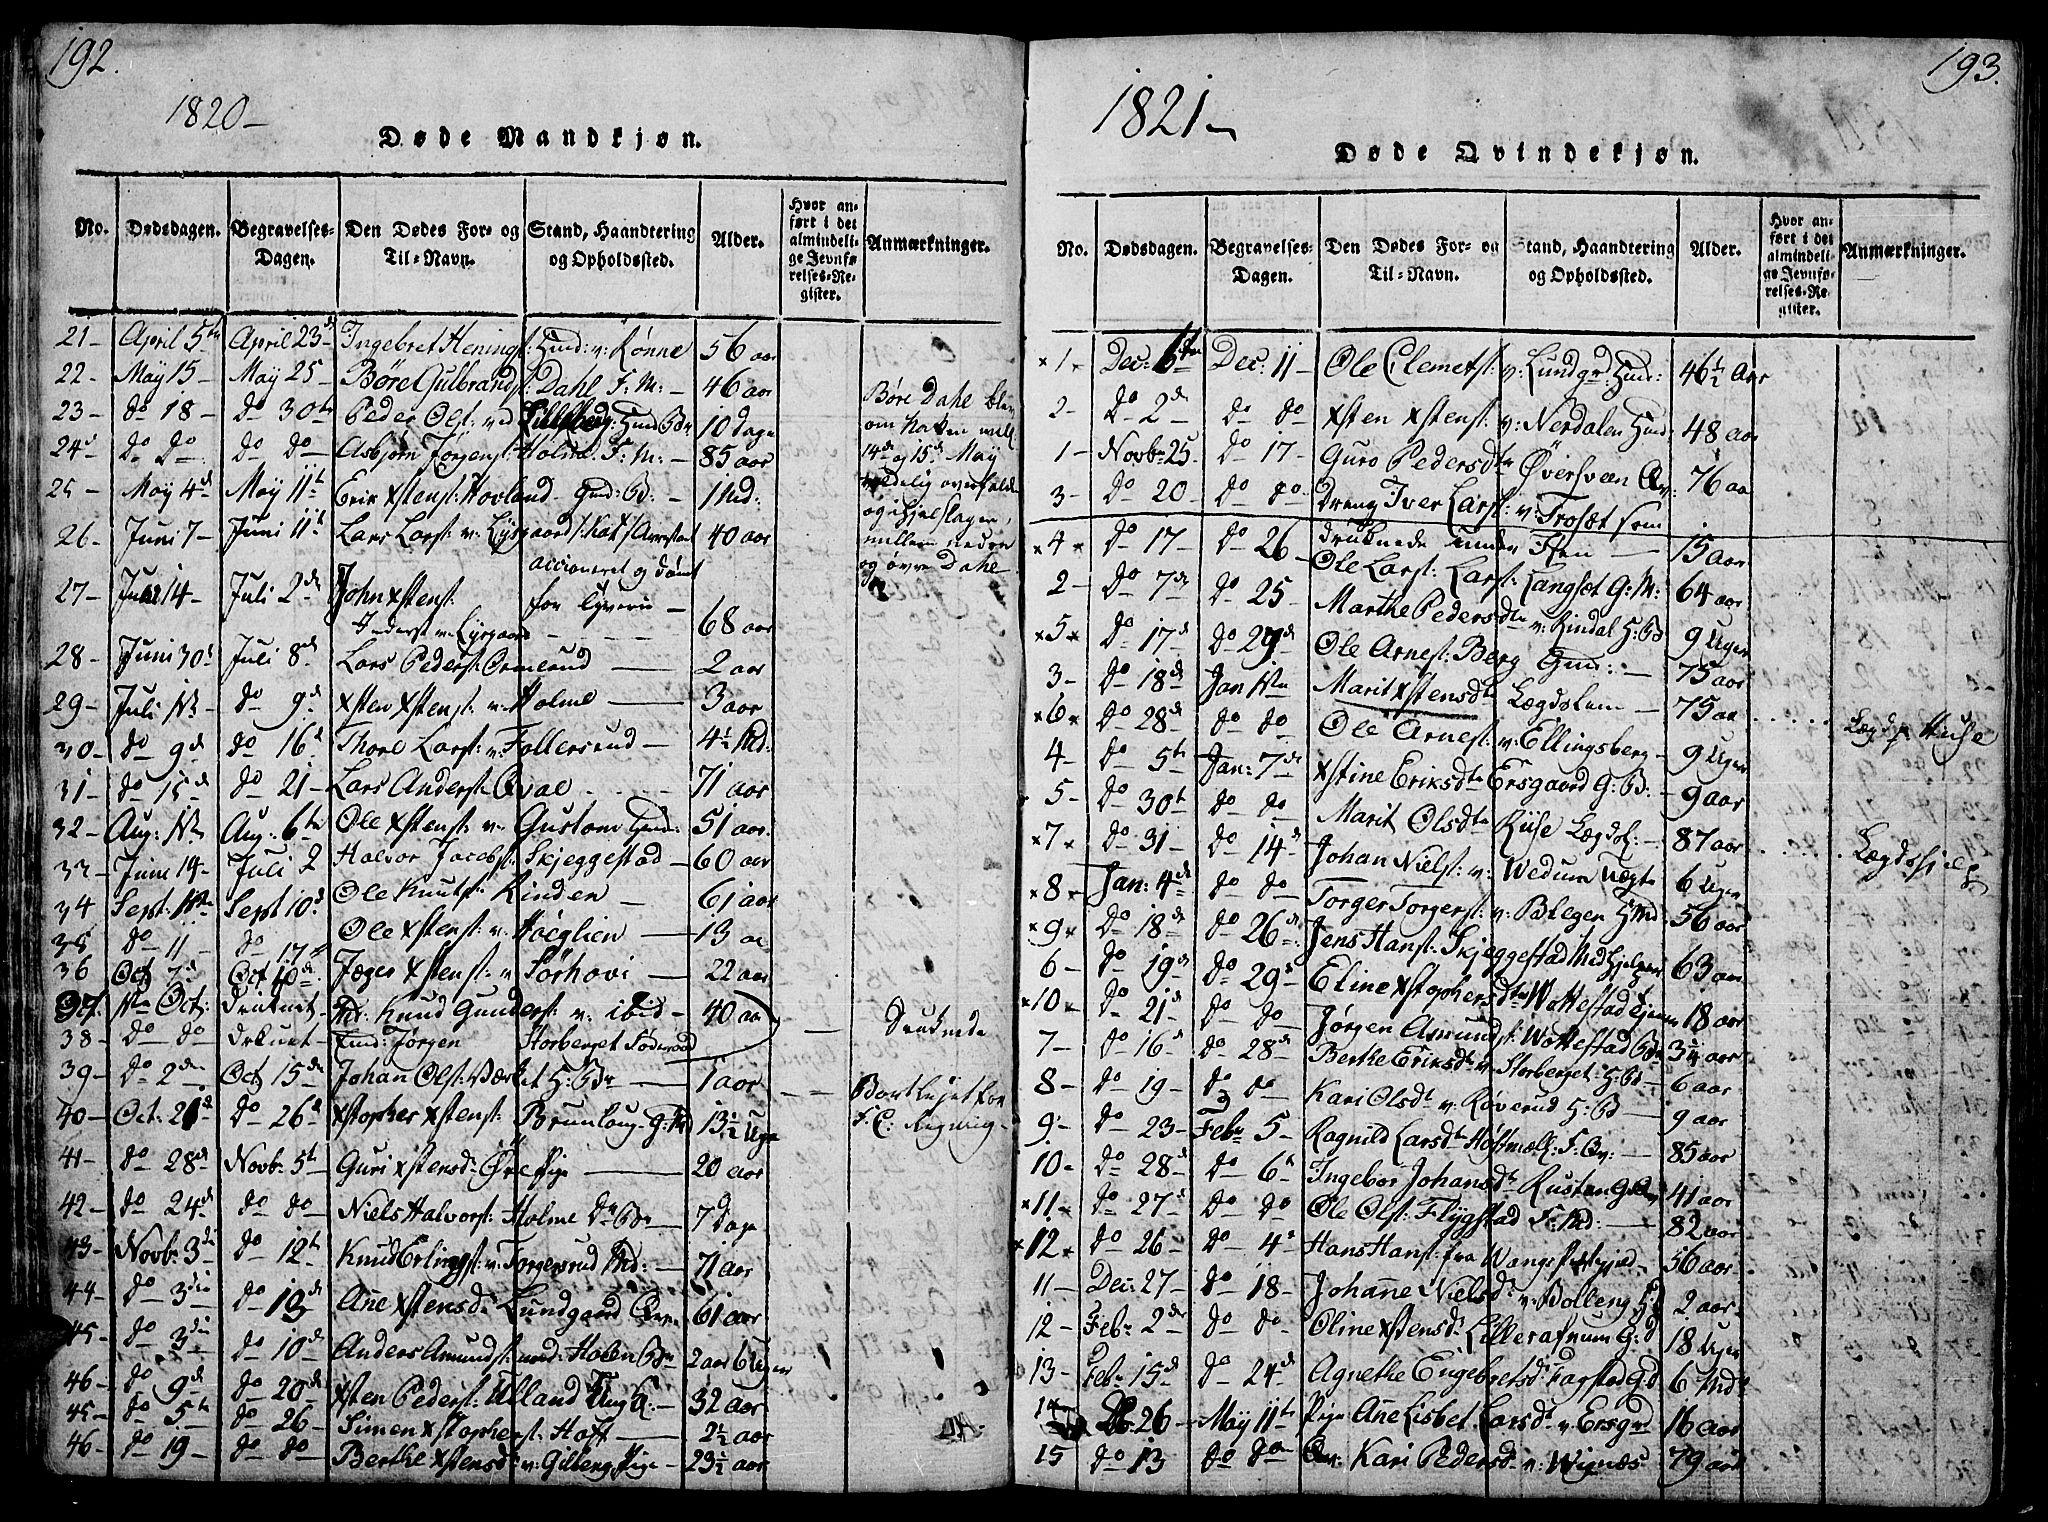 SAH, Fåberg prestekontor, Klokkerbok nr. 4, 1818-1837, s. 192-193